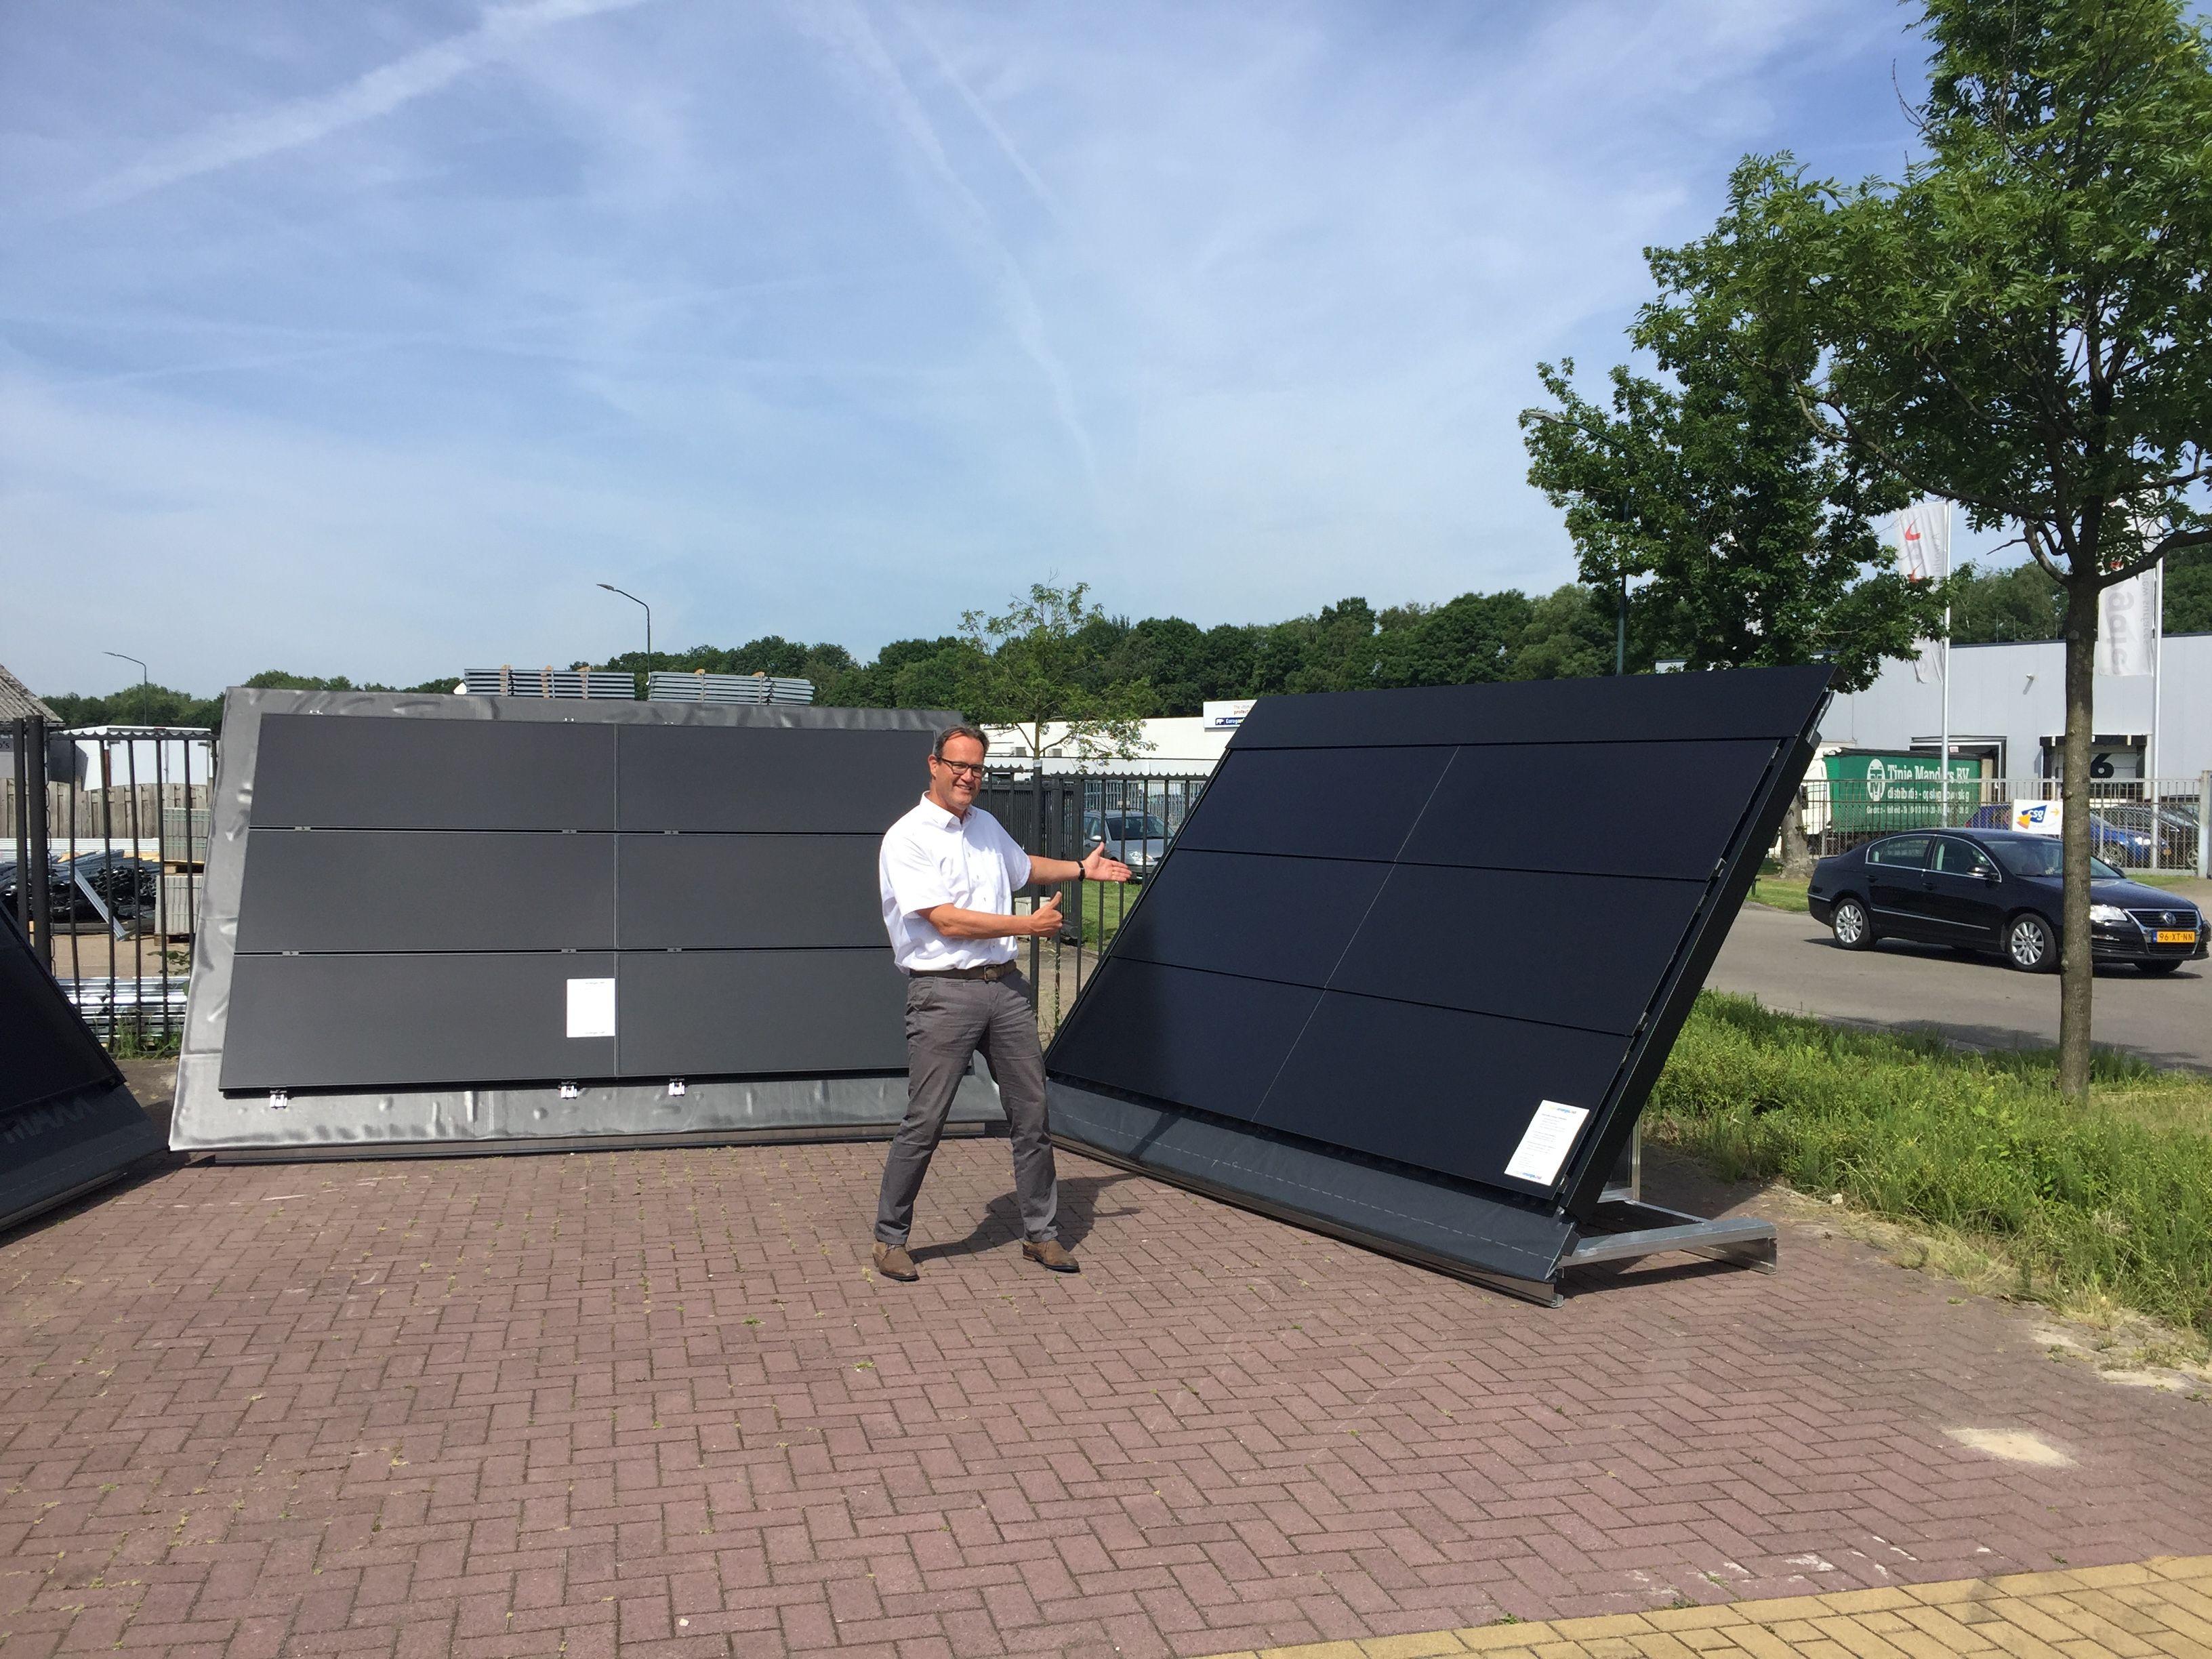 Ceo Of Eigenenergie Net Presenting The Simply Better Aesthetics Of Stion Frameless Cigs Modules Renewable Solar Roof Solar Panel Solar Panels